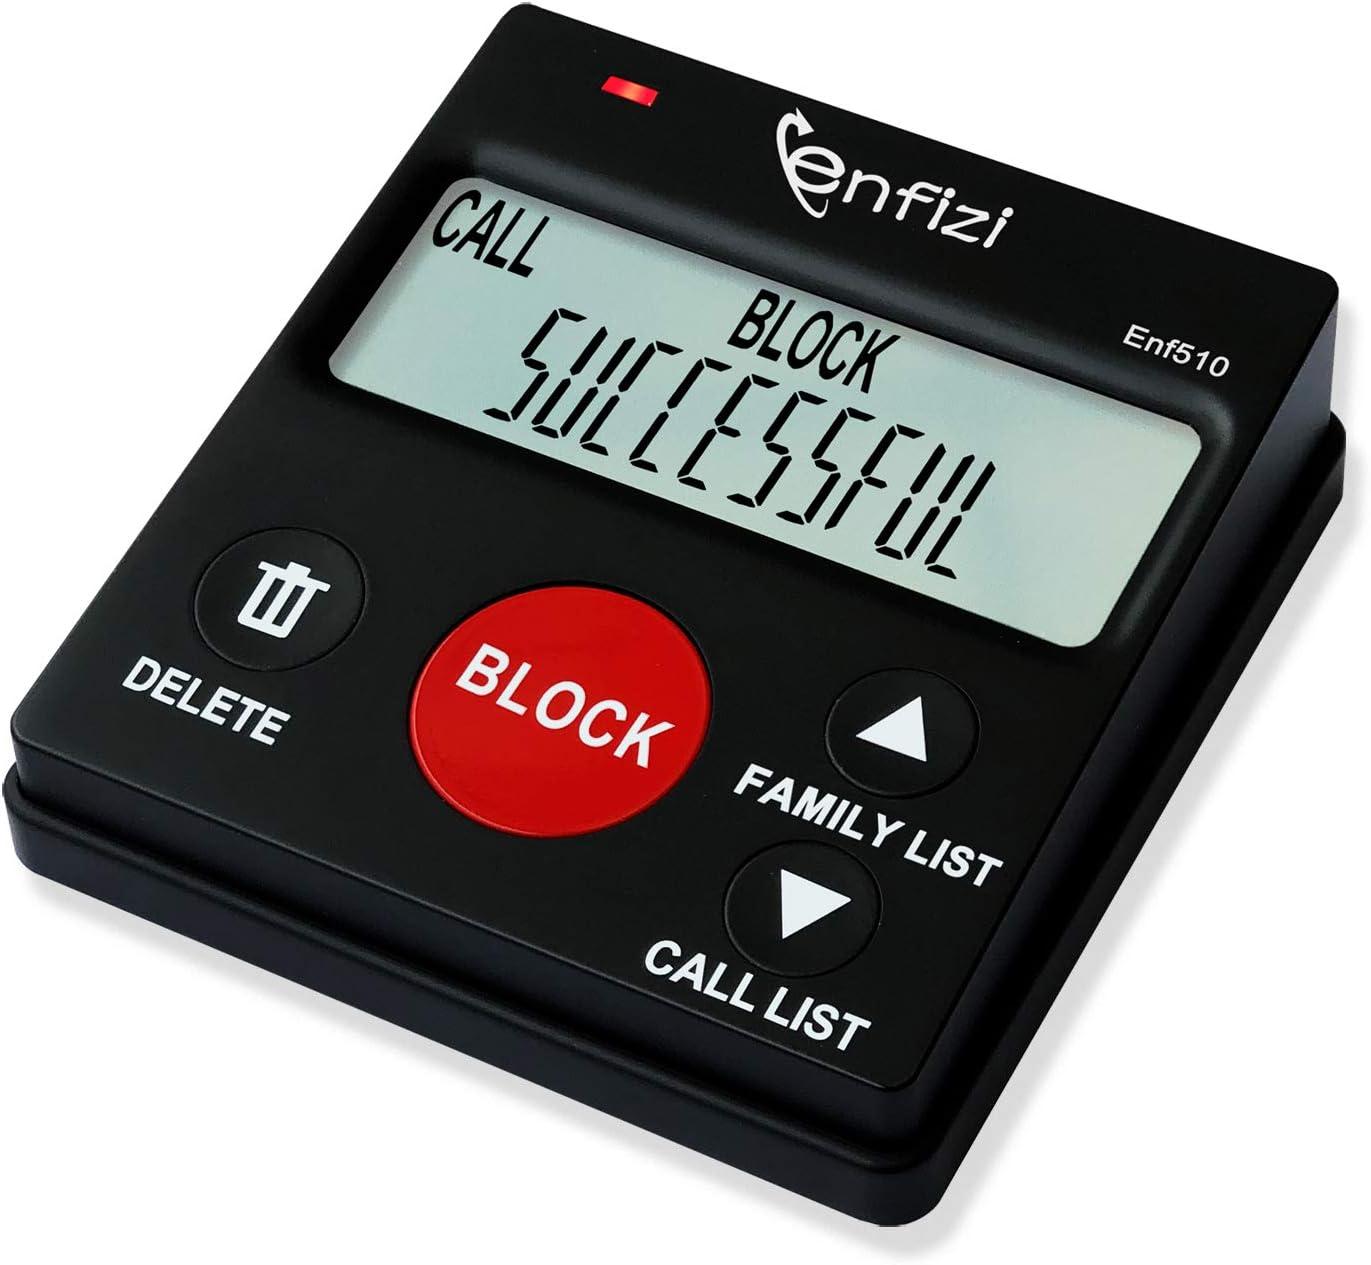 Enf510 Call Blocker for Landline Phones/Answering Machine/Home Cordless Phones,Spam Calls Blocker, Family Function, Caller ID Box